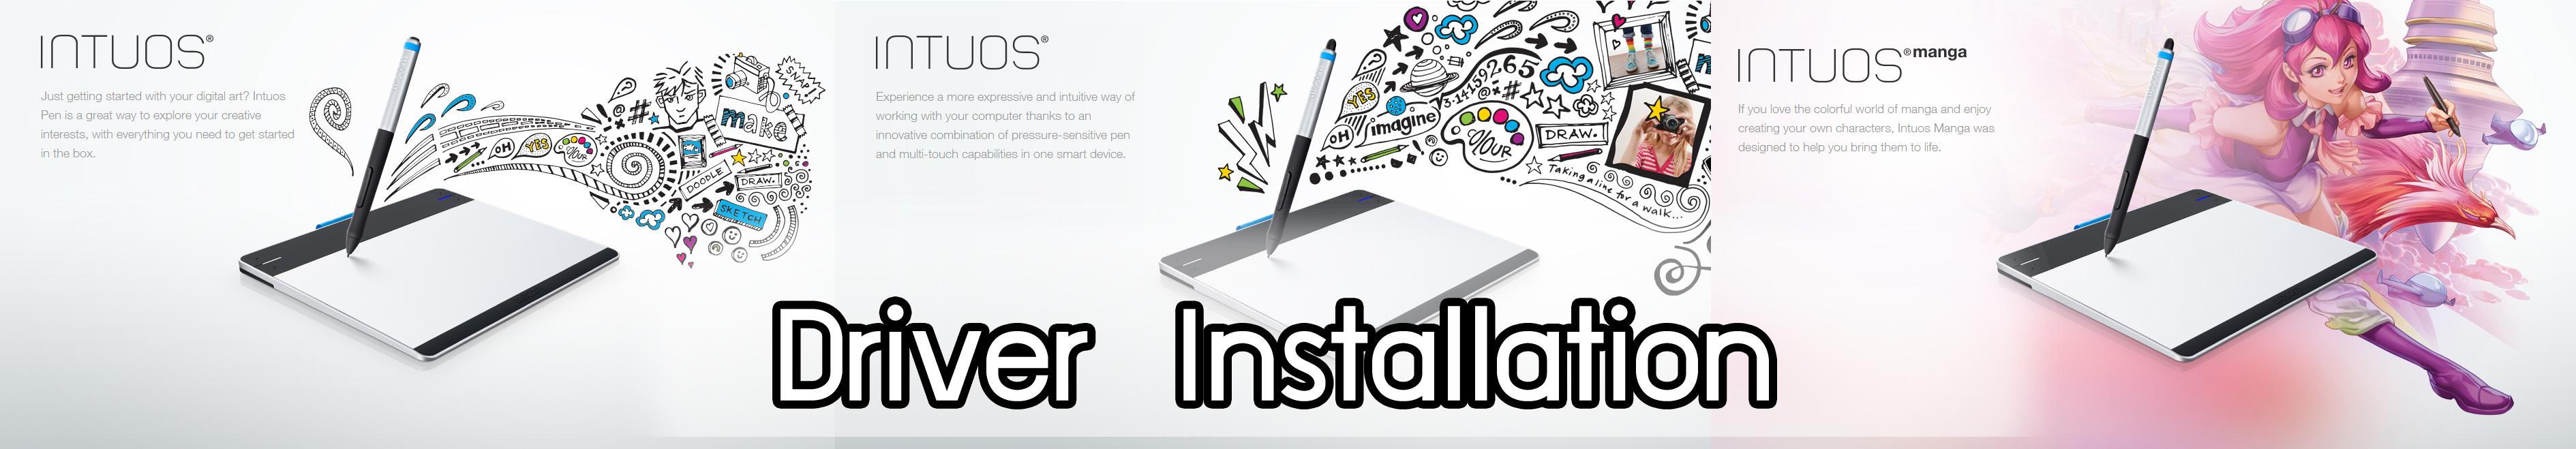 Wacom, Intuos, Intuos Pro, Cintiq, Driver Installation, Install